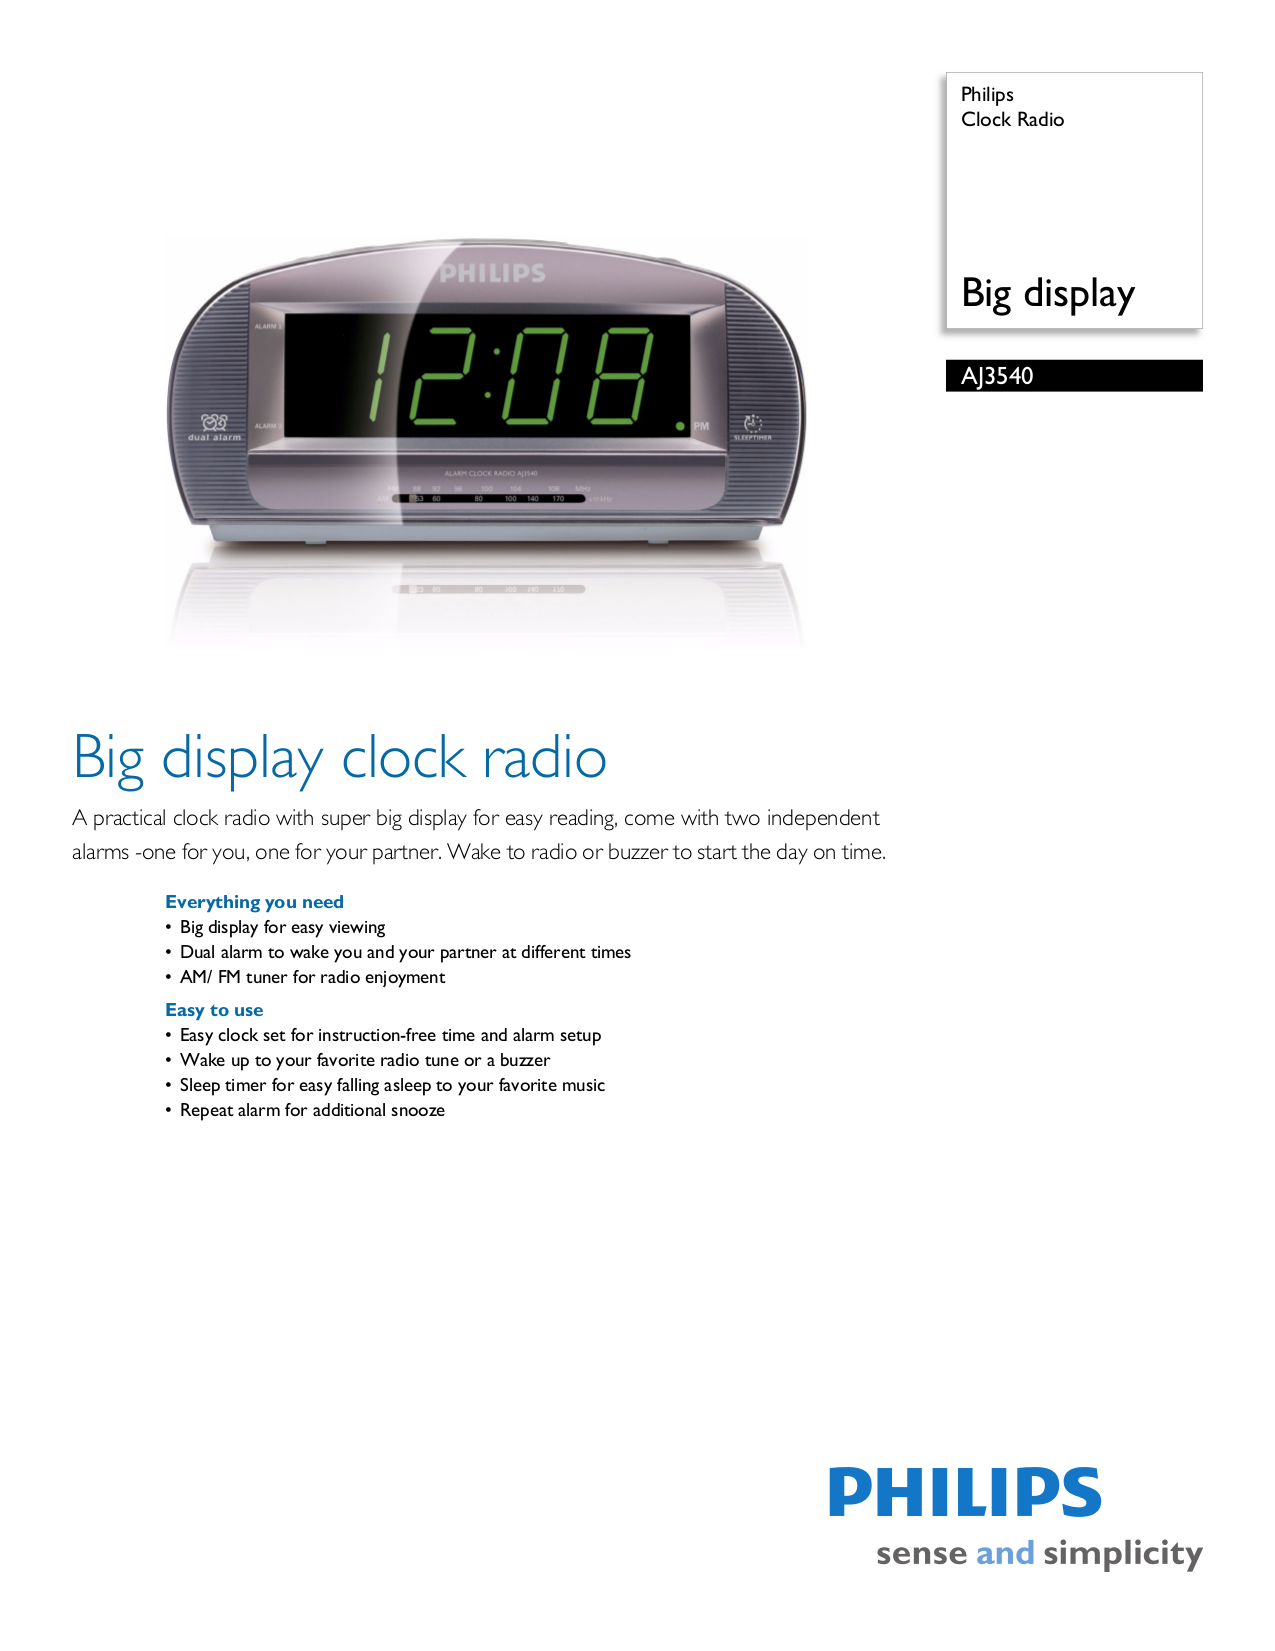 download free pdf for philips aj3540 clock radio manual rh umlib com Philips Clock Radio Time Set philips clock radio aj3540 manual